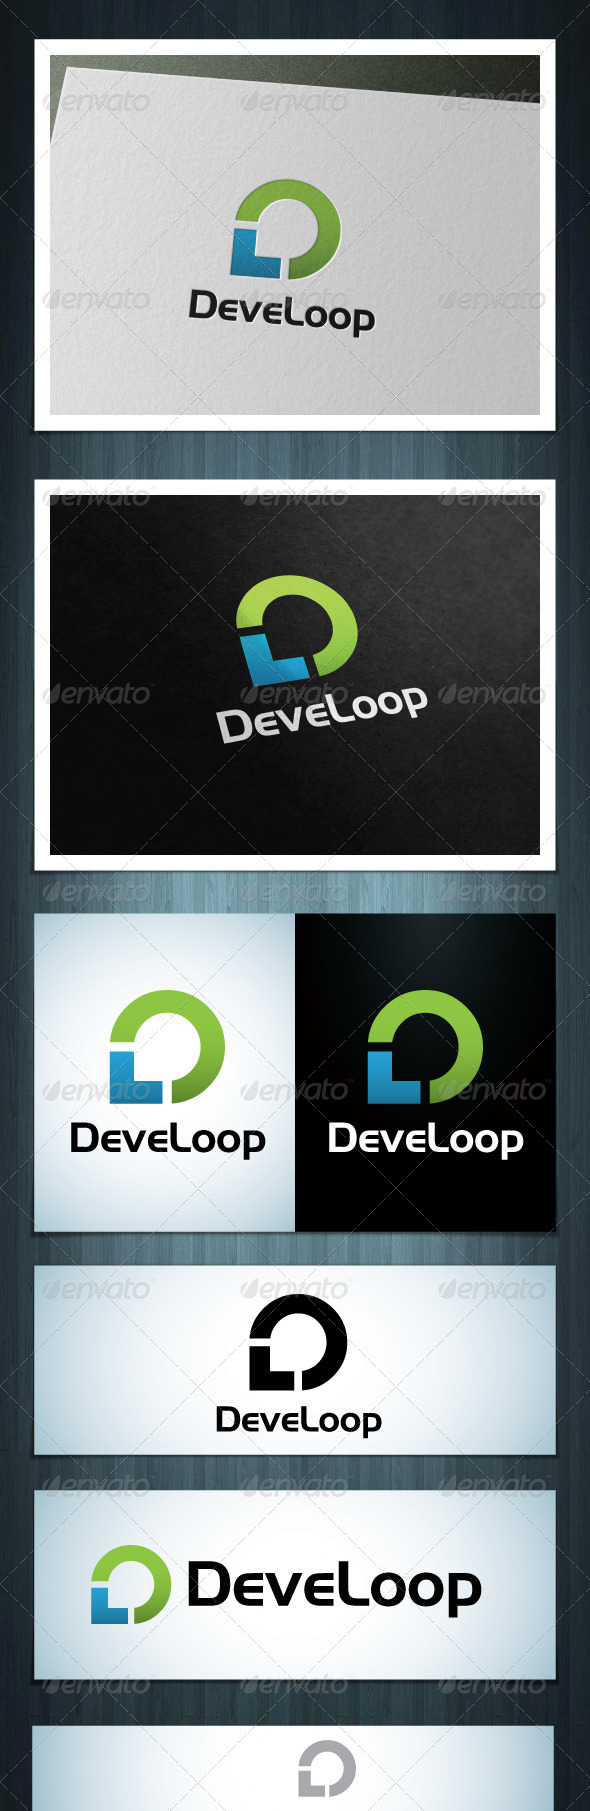 GraphicRiver Develoop 5821076